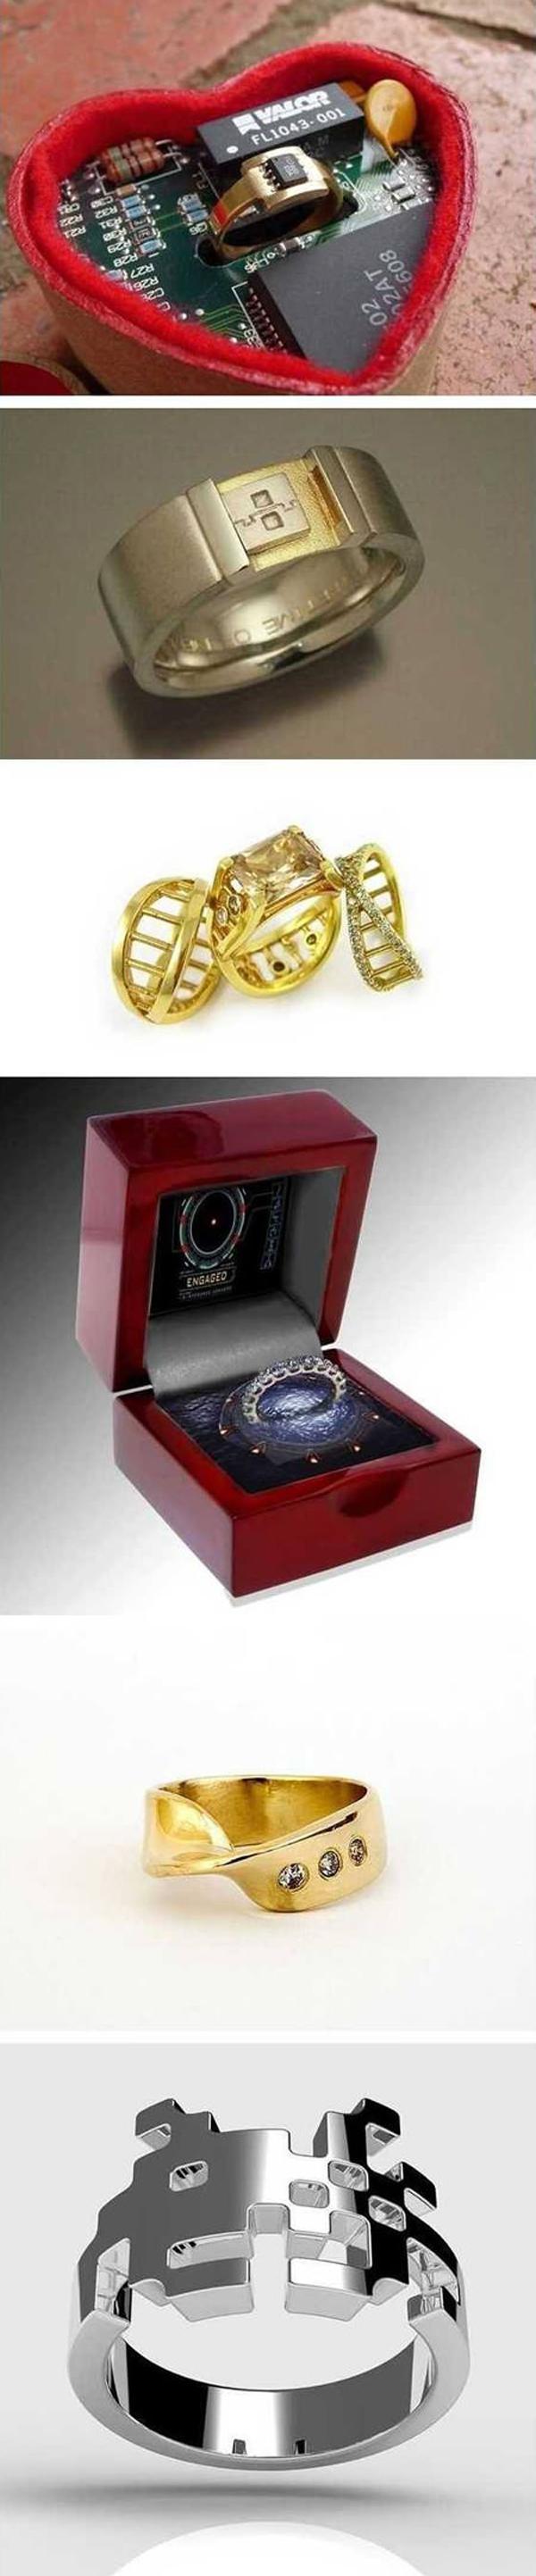 gamer wedding rings gamer wedding rings Geeky Wedding Rings Geek wedding rings